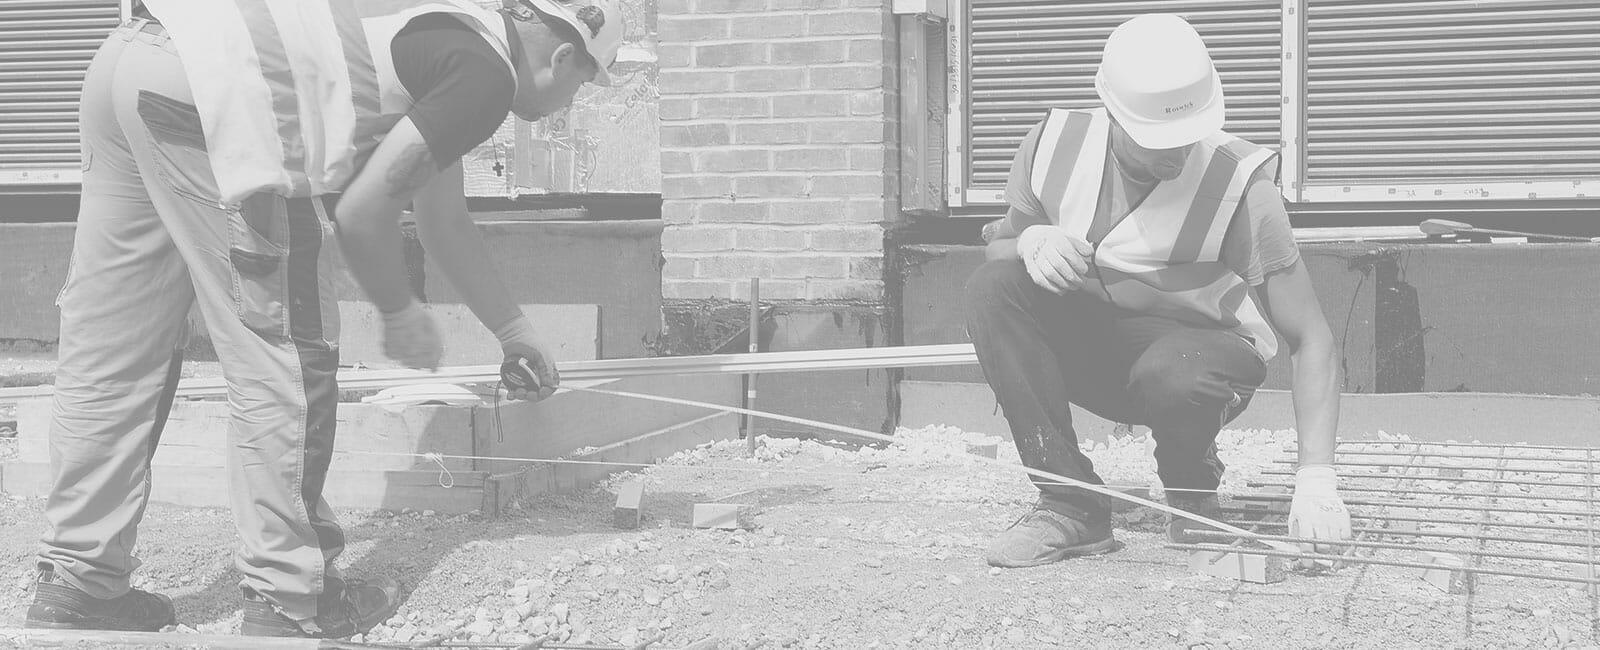 Services - concrete work